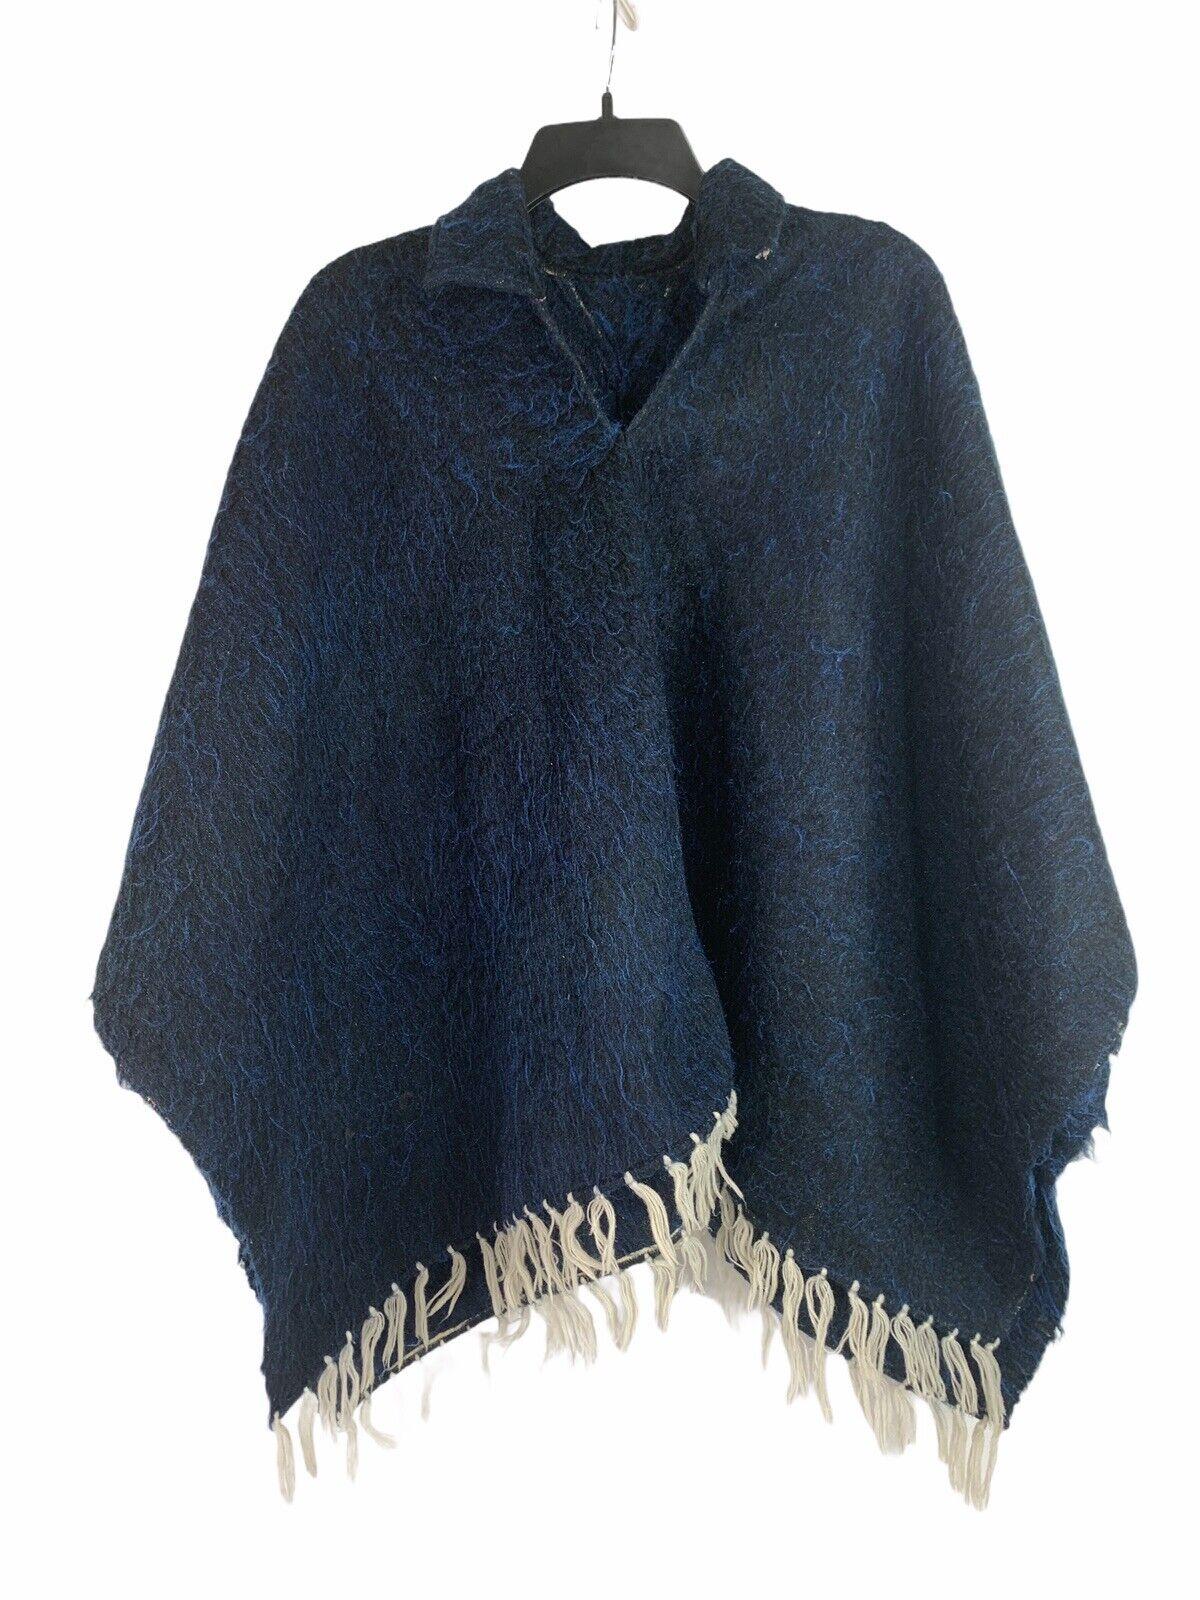 Vintage Poncho With Fringe Spanish Blue Alpaca Wool Boho Central South America